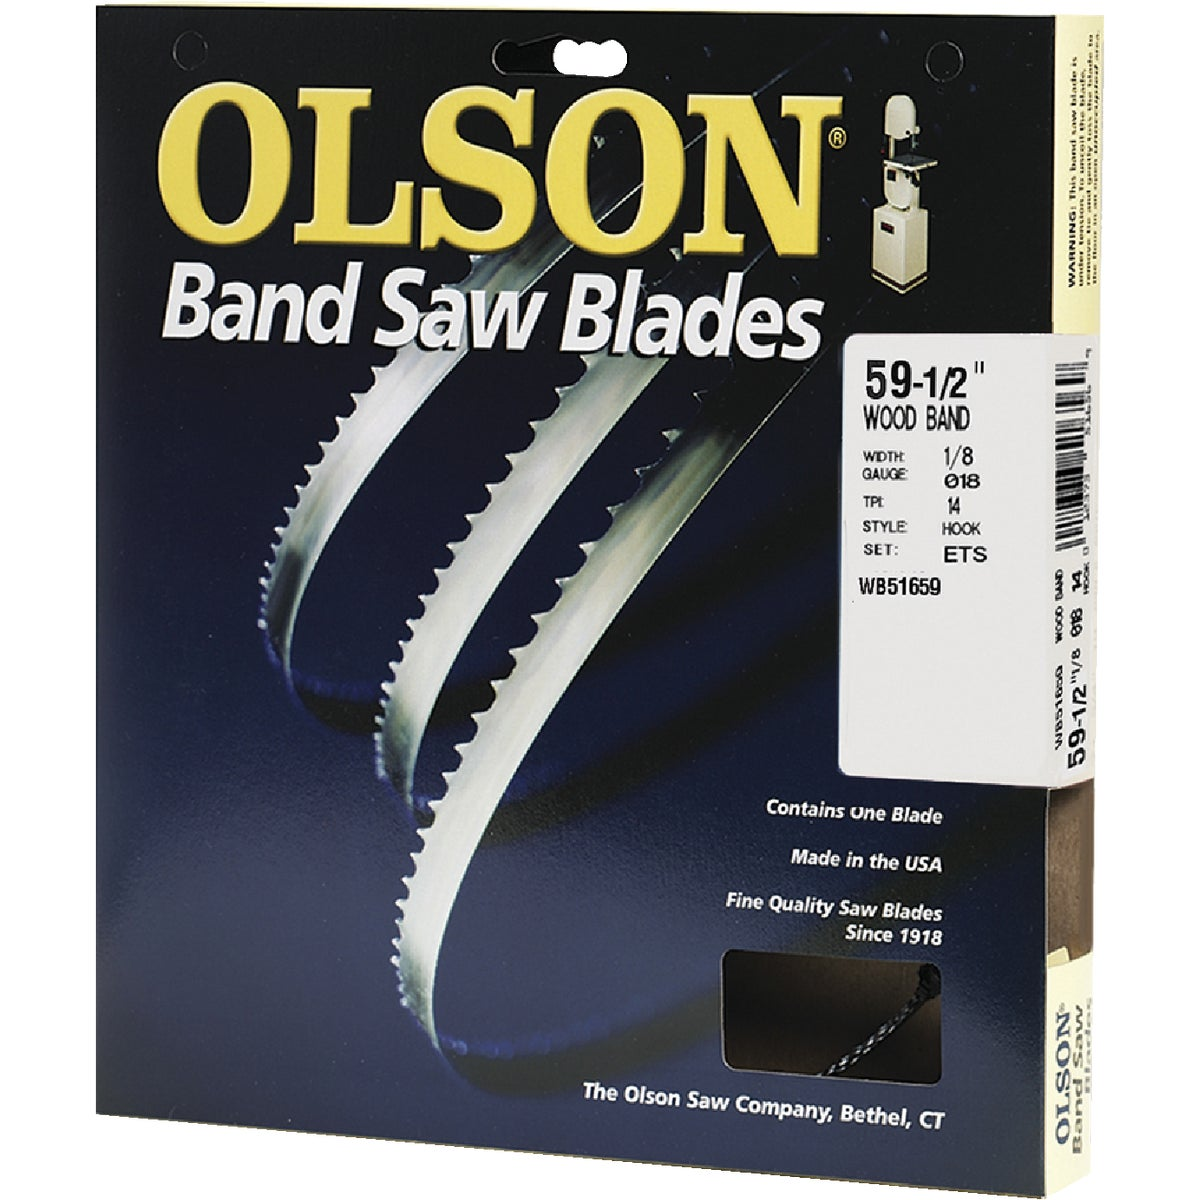 "59-1/2"" BANDSAW BLADE"